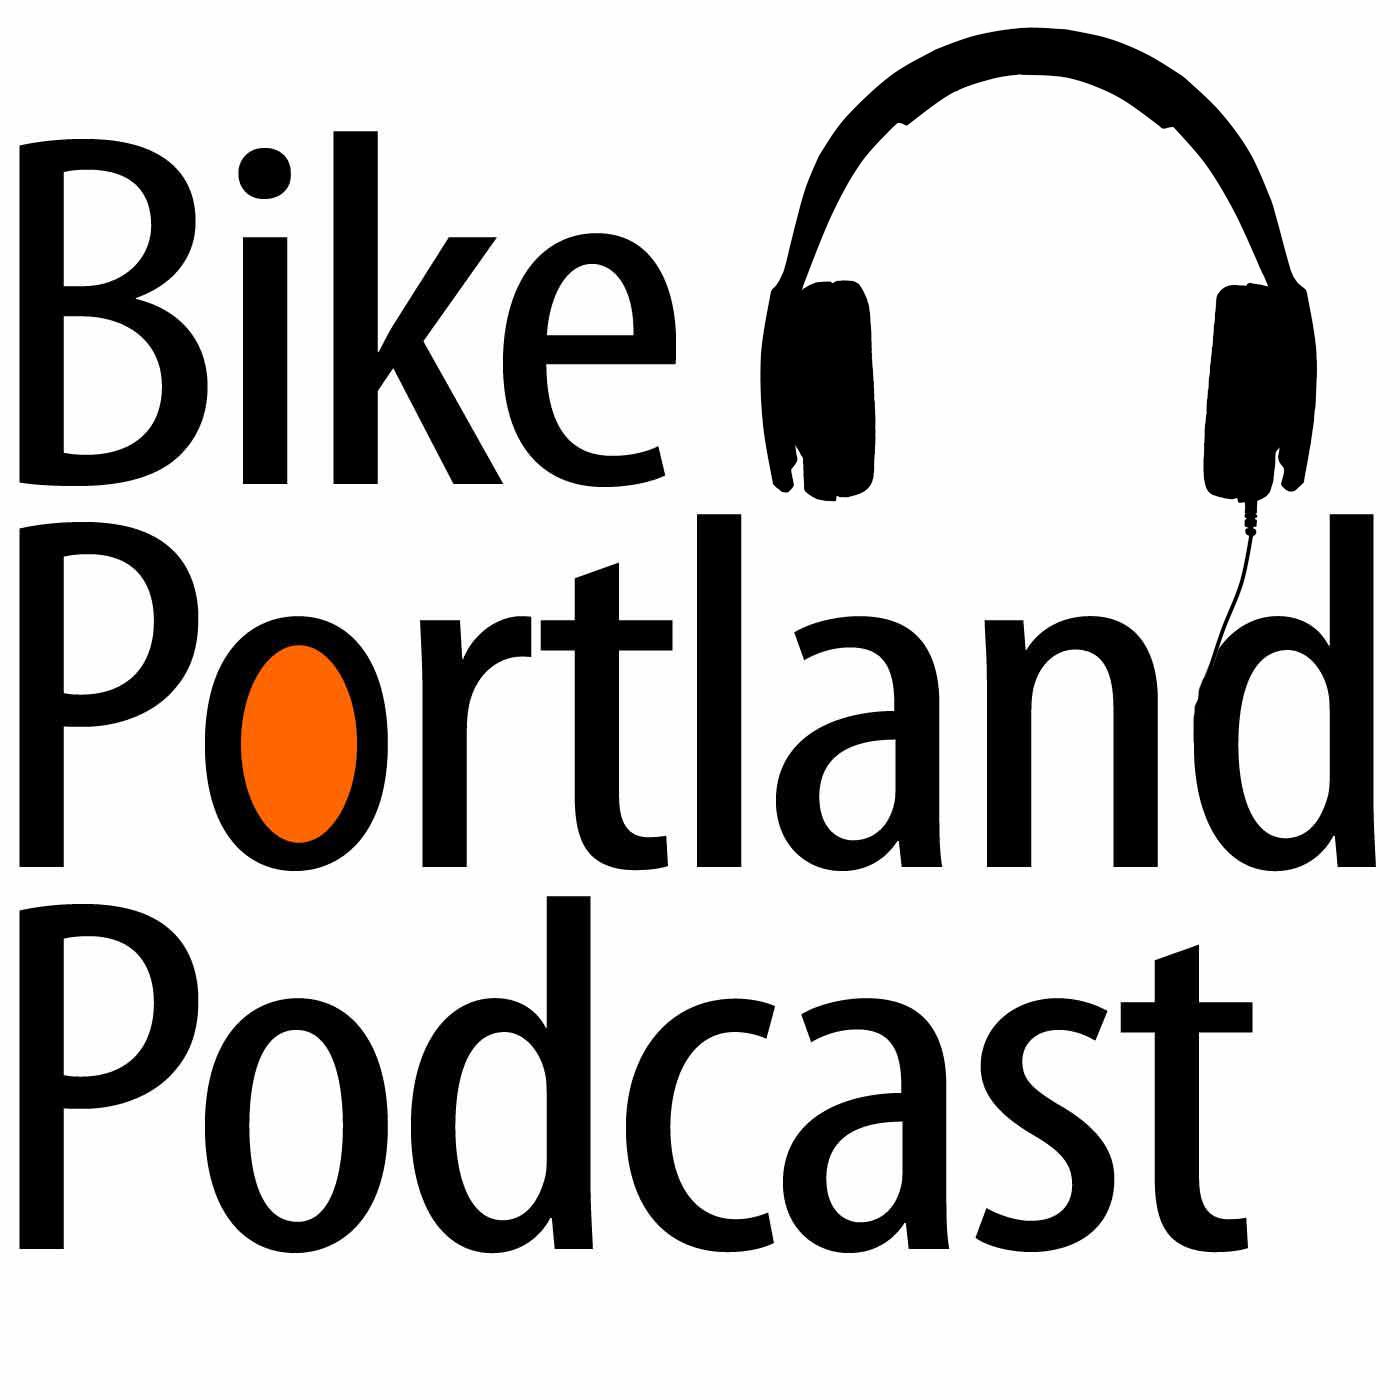 BikePortland Podcast logo